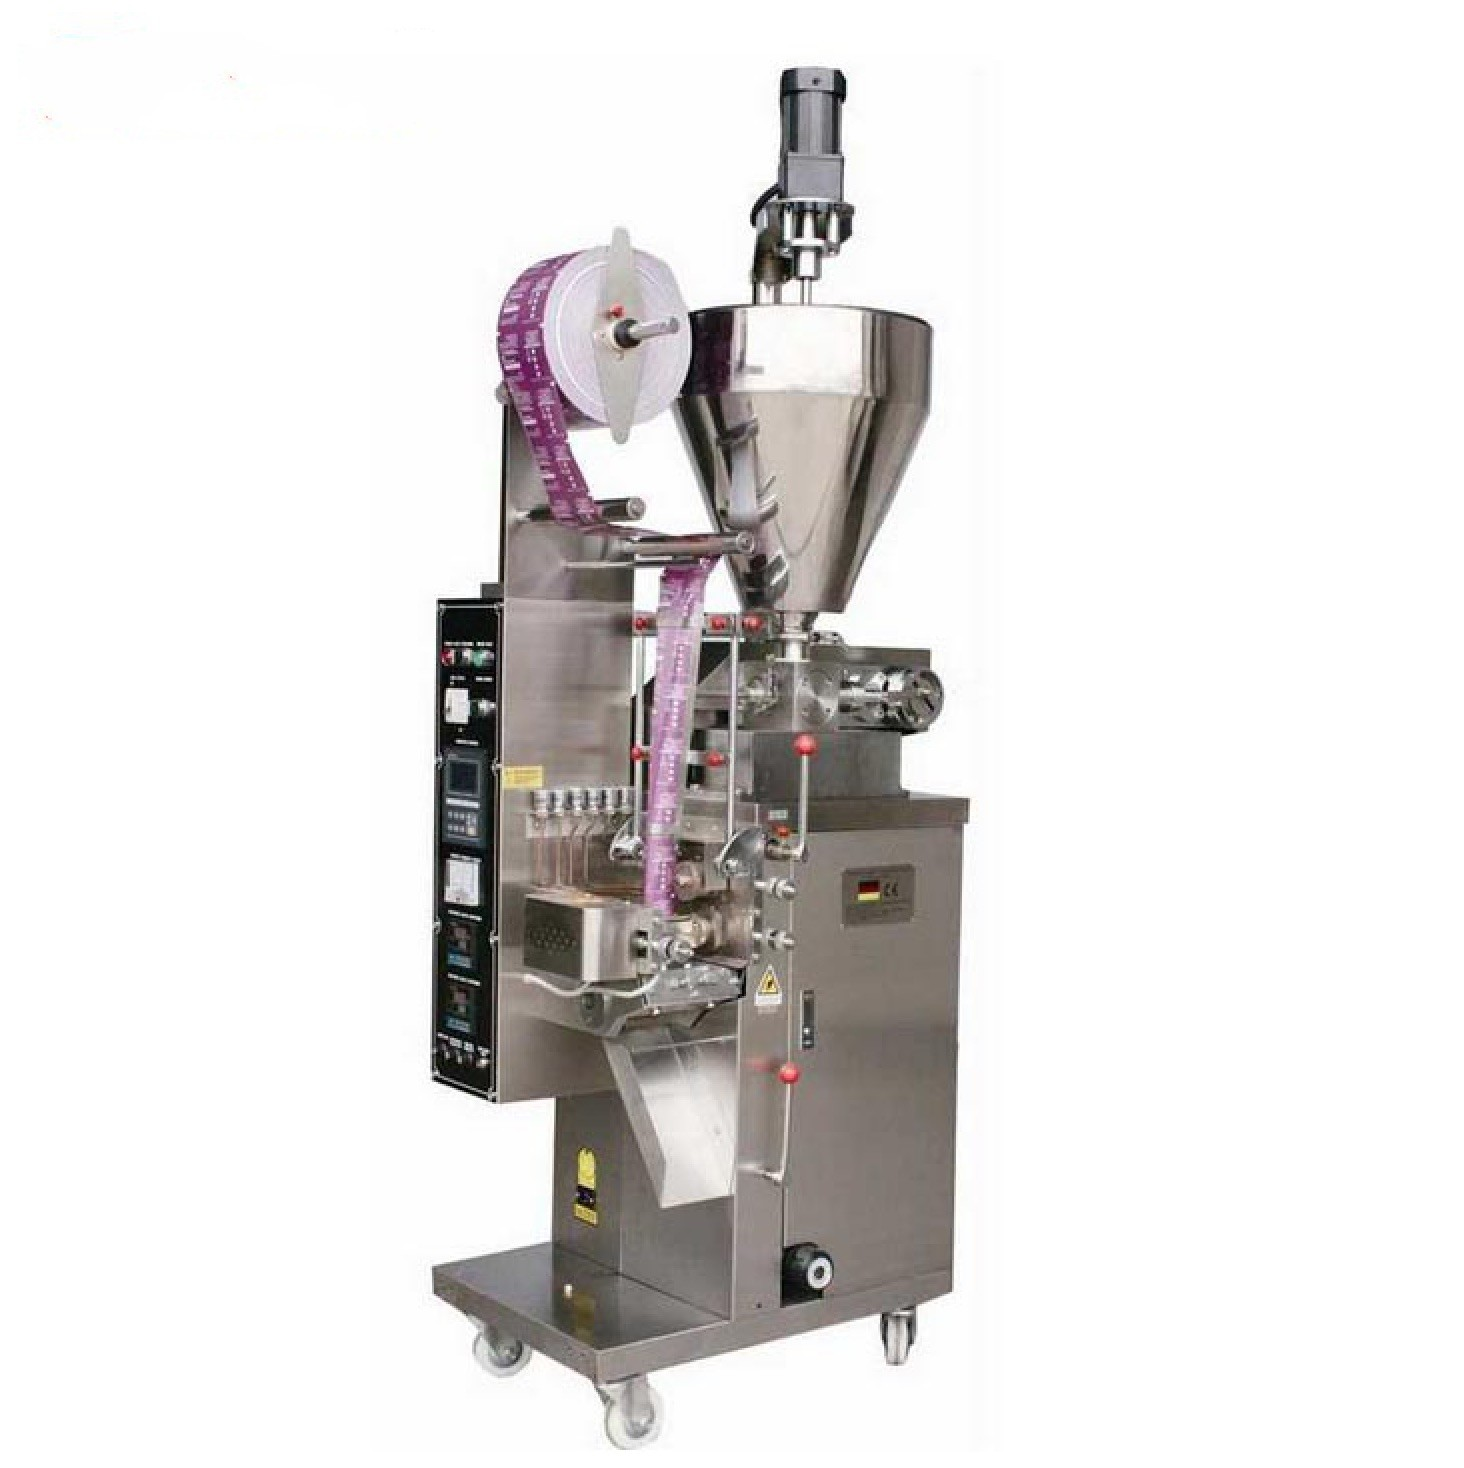 Sachet Bag Filling Machine Liquid / Powder Filling And Sealing Machine For Coffee